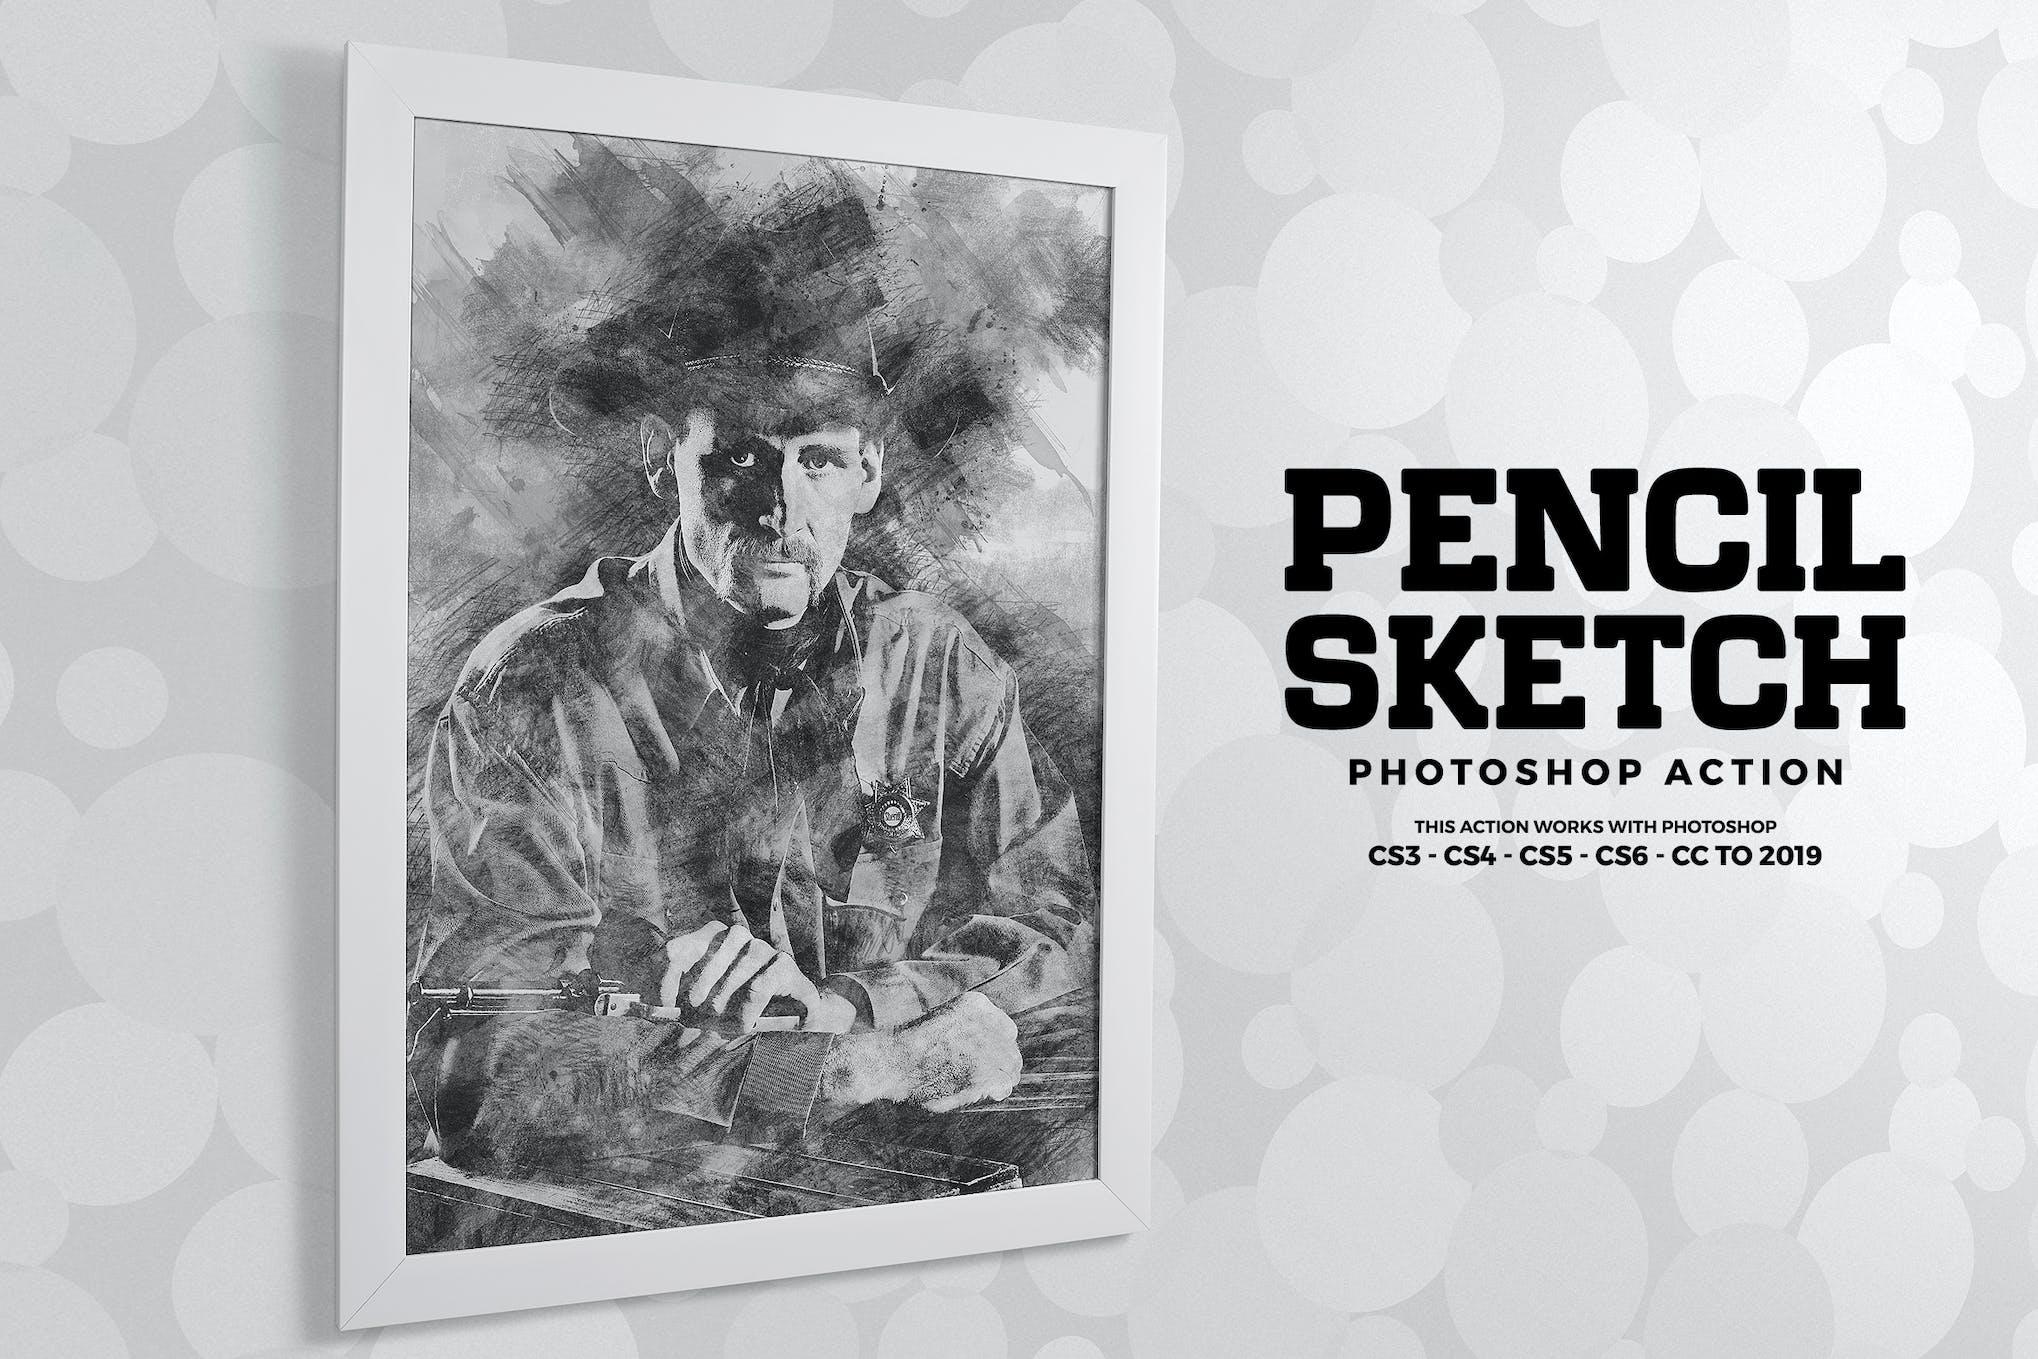 Pencil sketch photoshop action by ab designer on envato elements